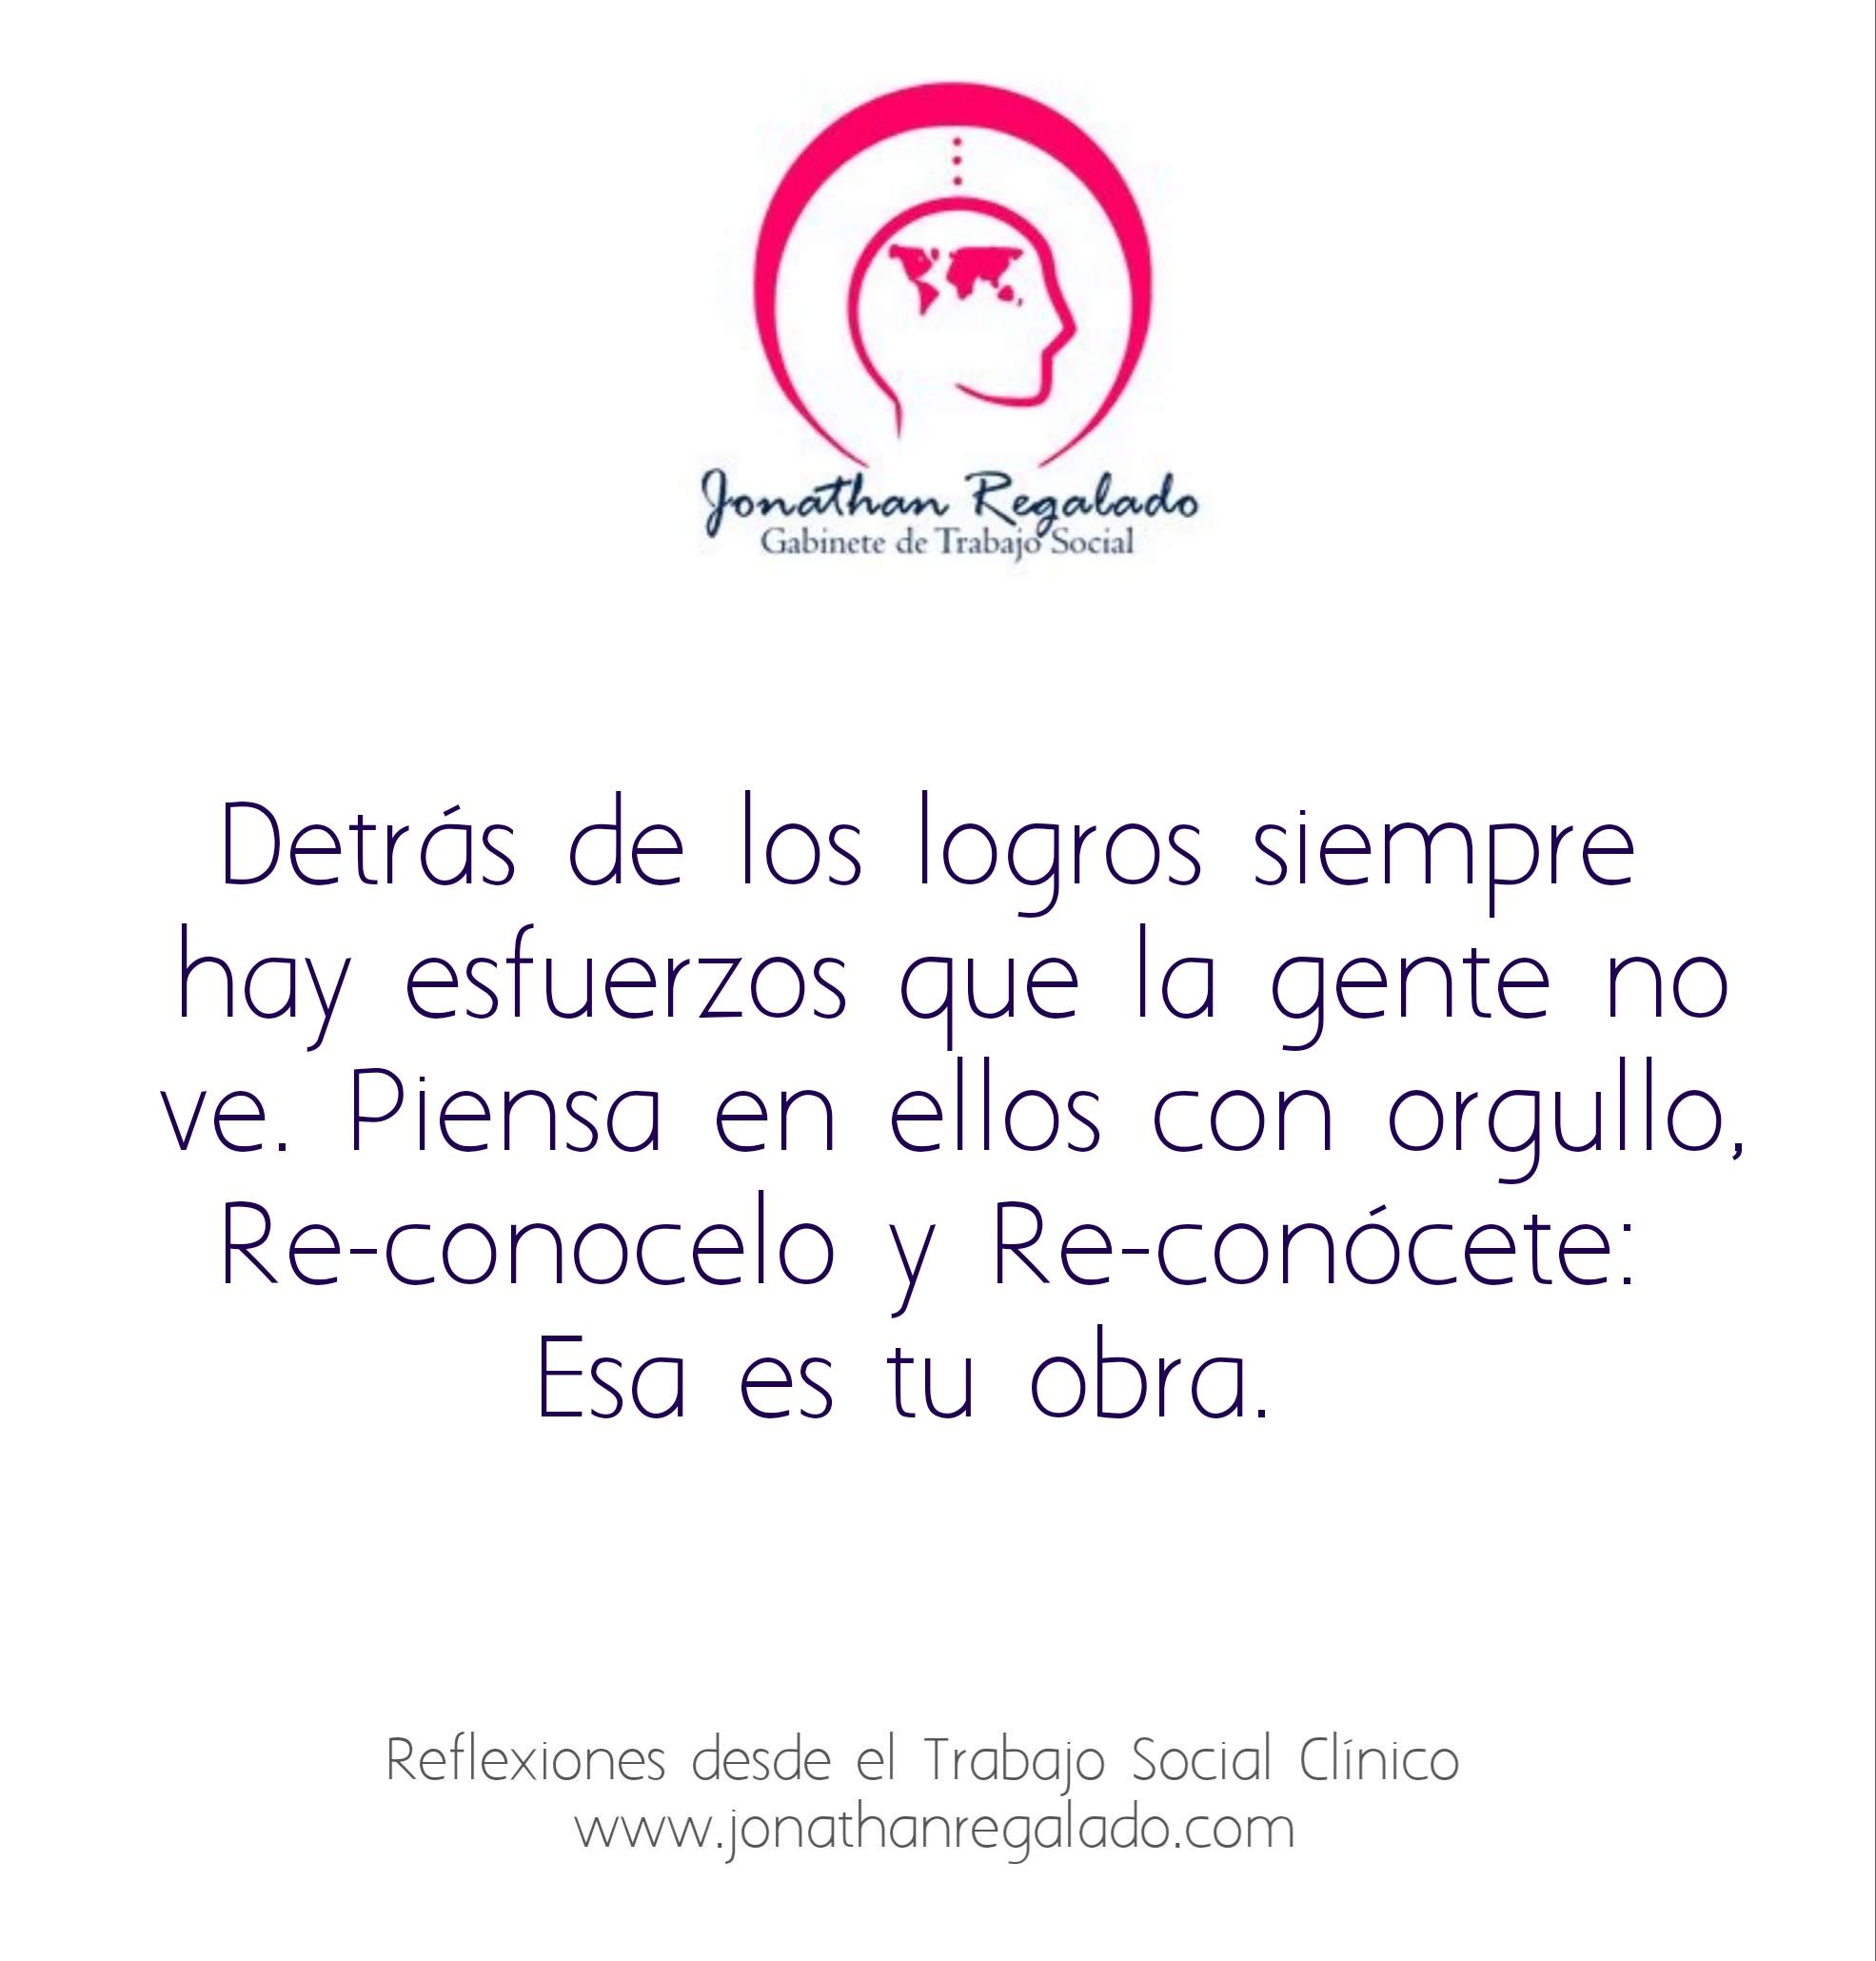 Blanco_559356312644856